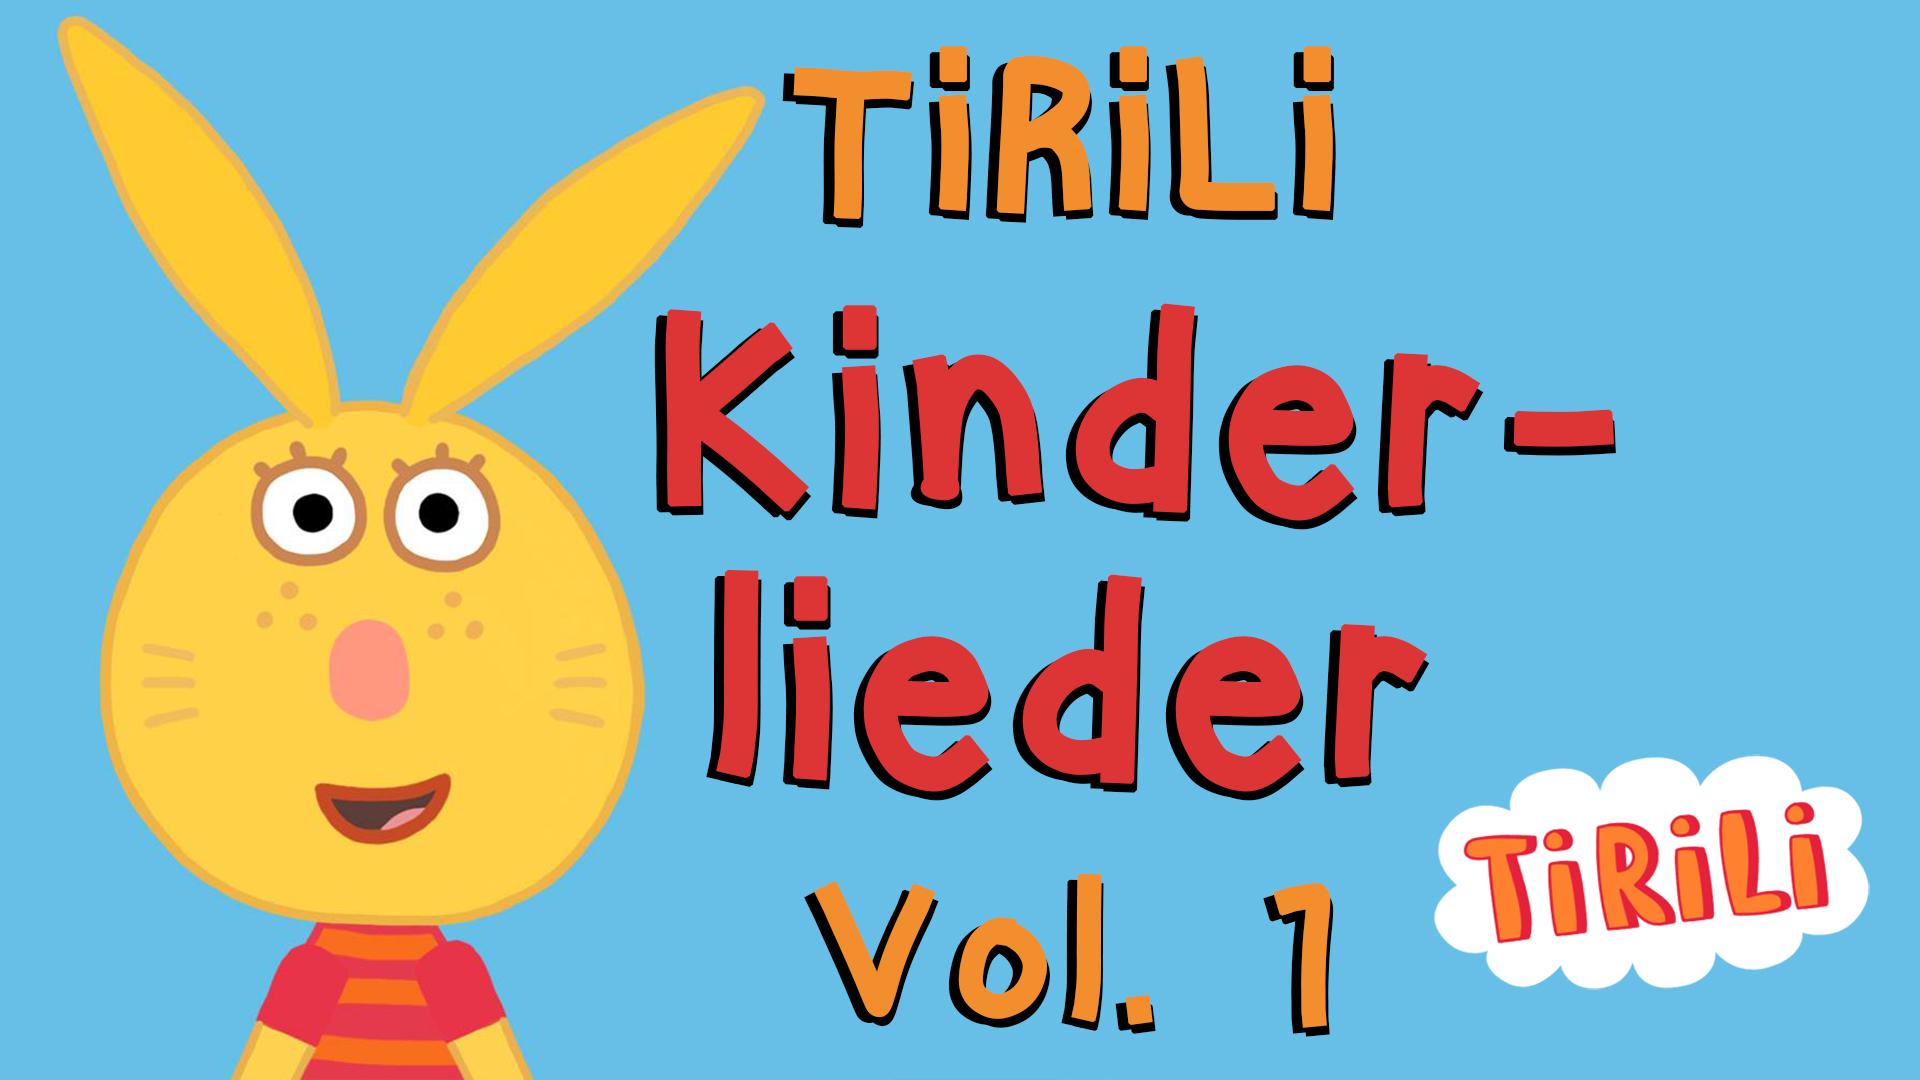 Tirili Kinderlieder Vol.1